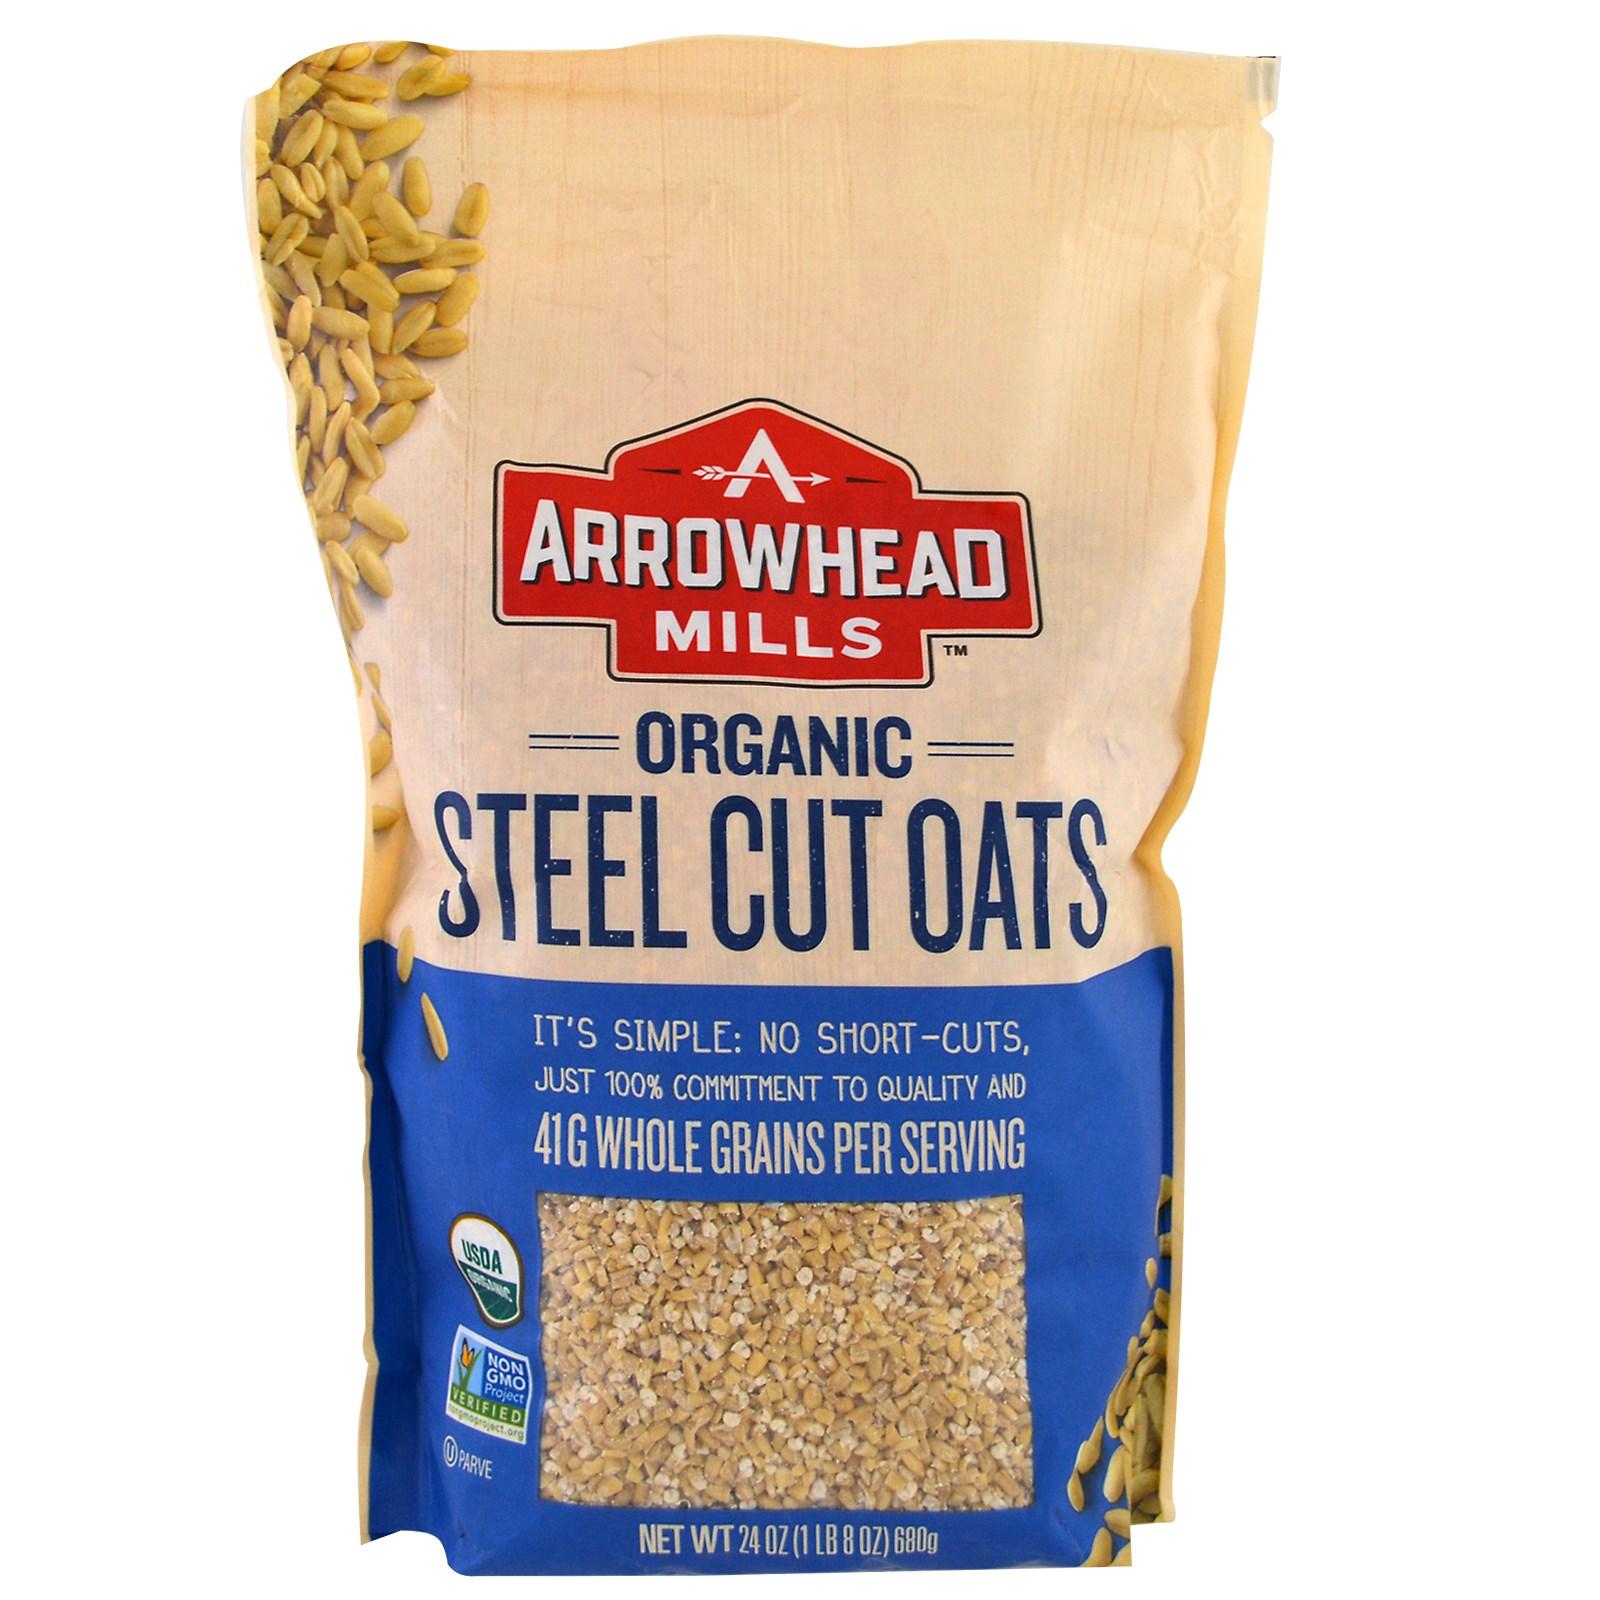 Arrowhead Mills, Organic Steel Cut Oats, Hot Cereal, 24 oz (pack of 6)